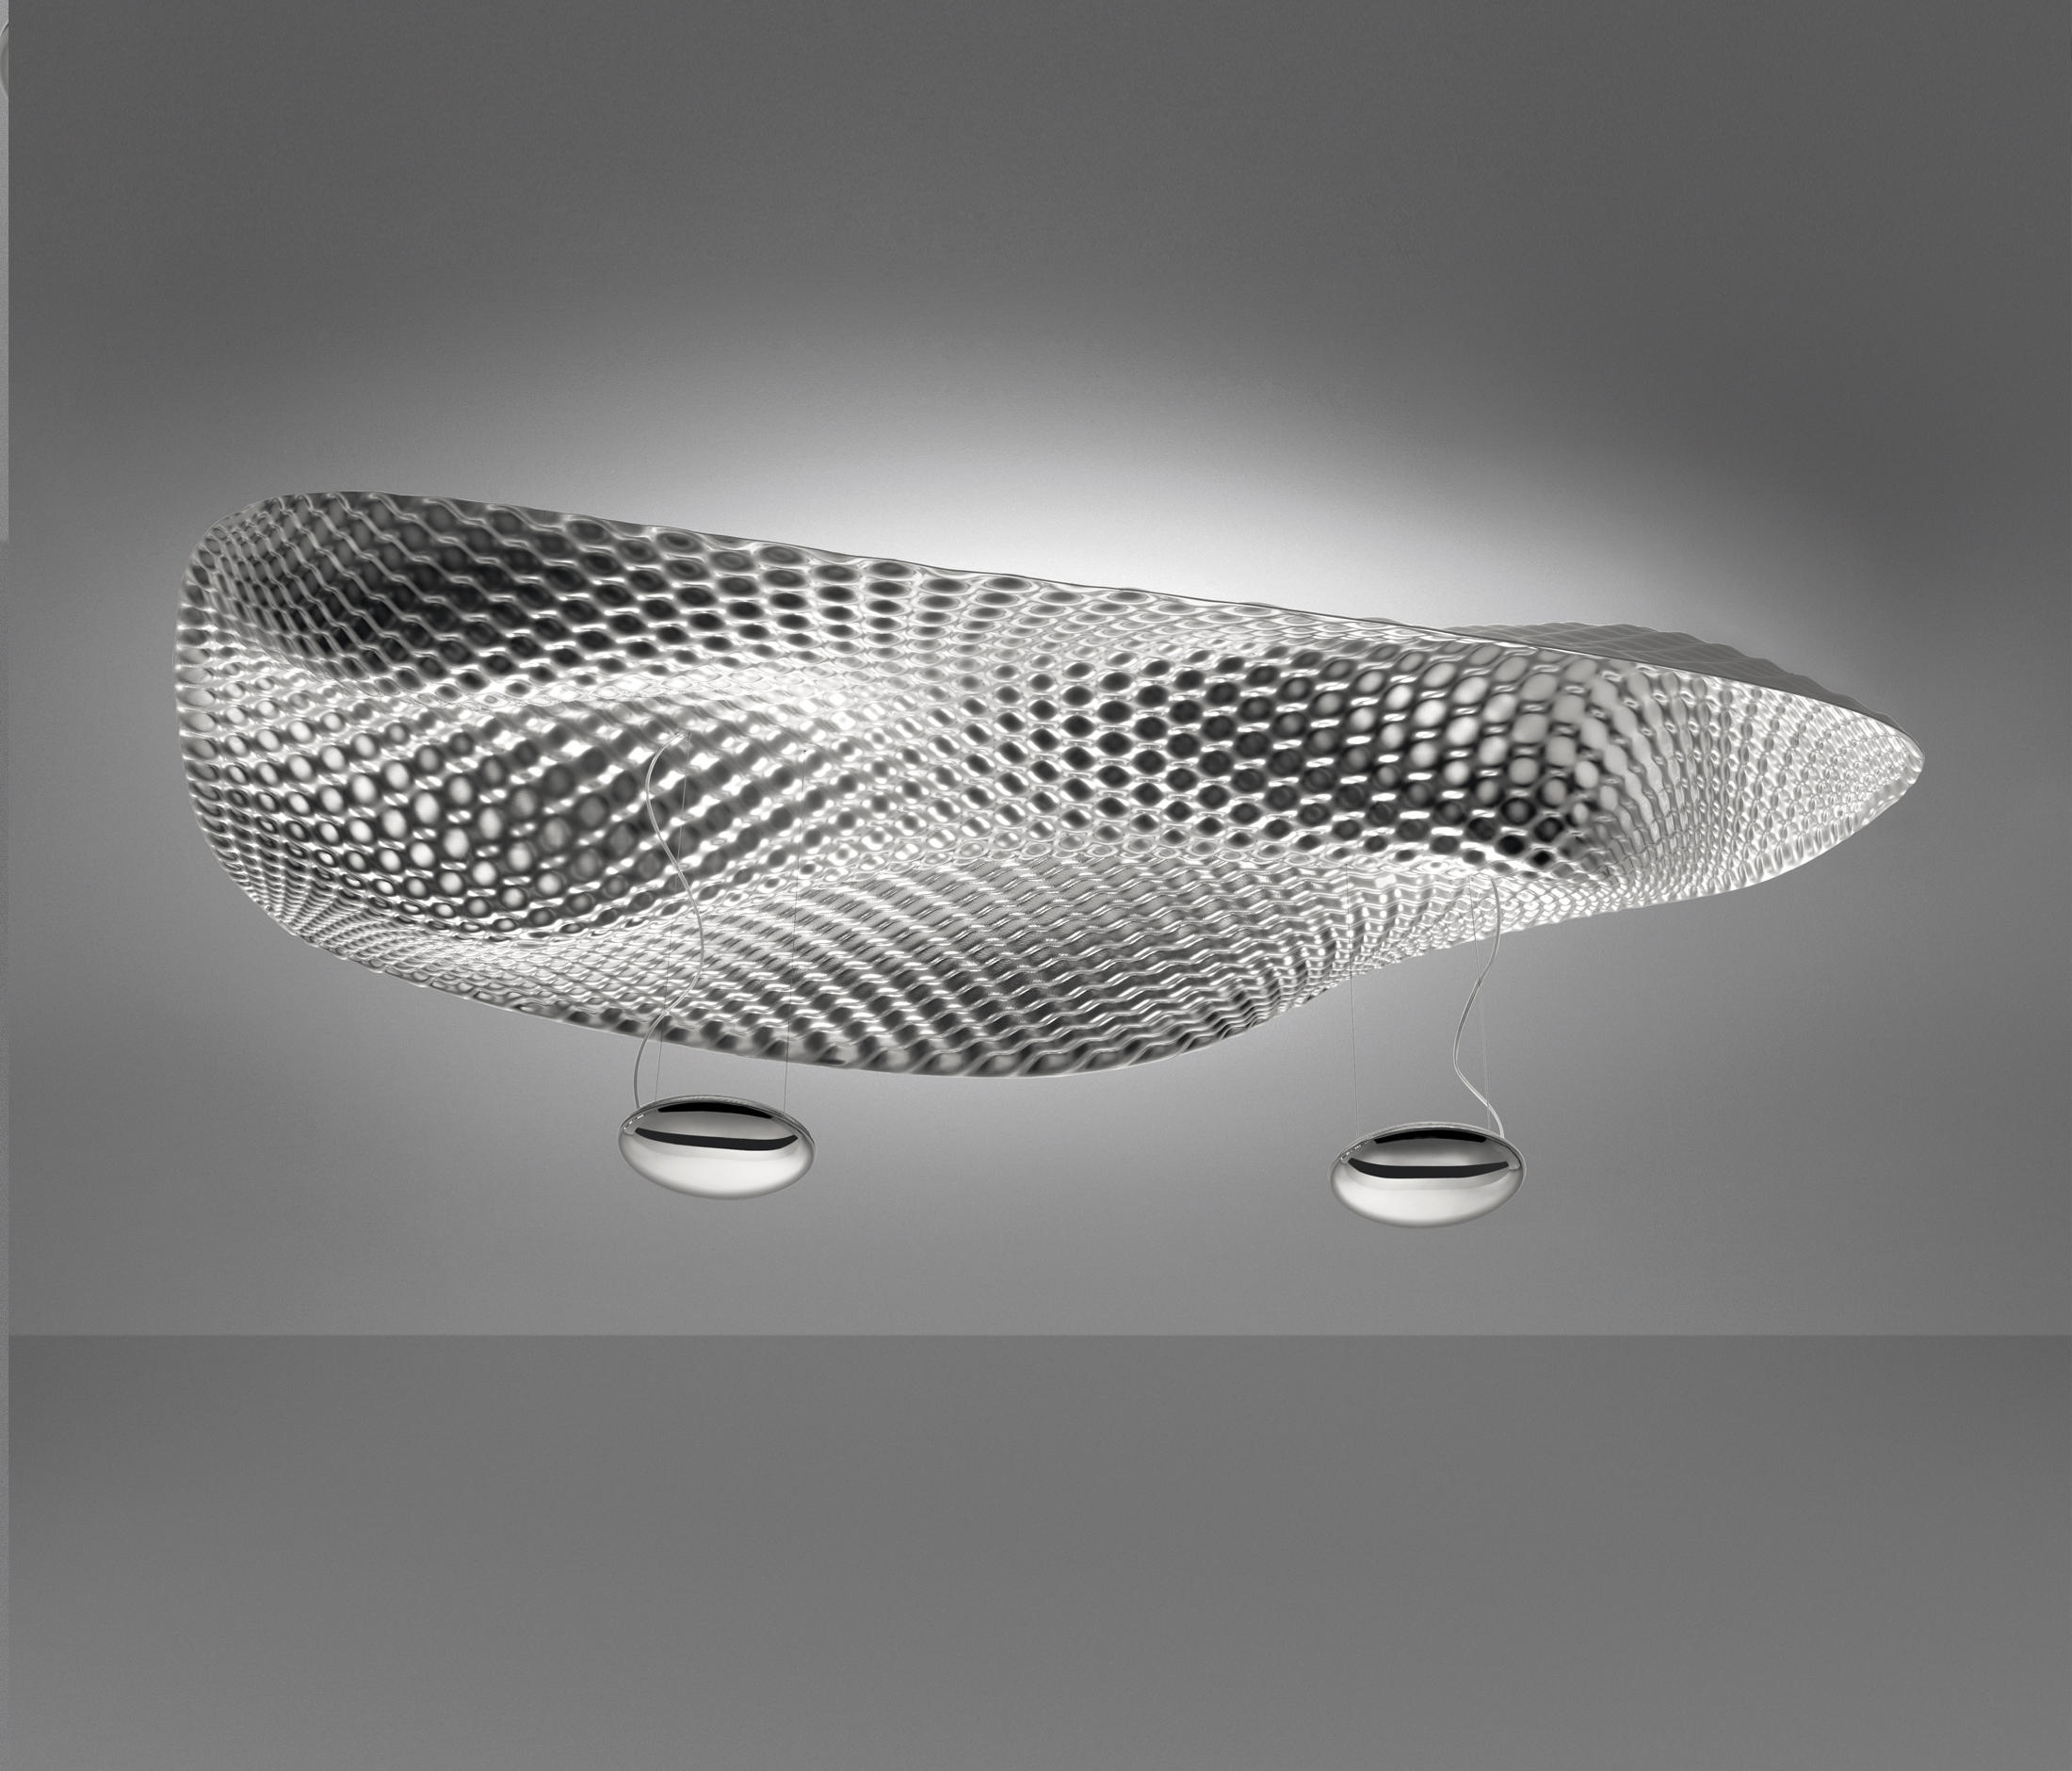 cosmic angel ceiling lamp general lighting from artemide architonic. Black Bedroom Furniture Sets. Home Design Ideas